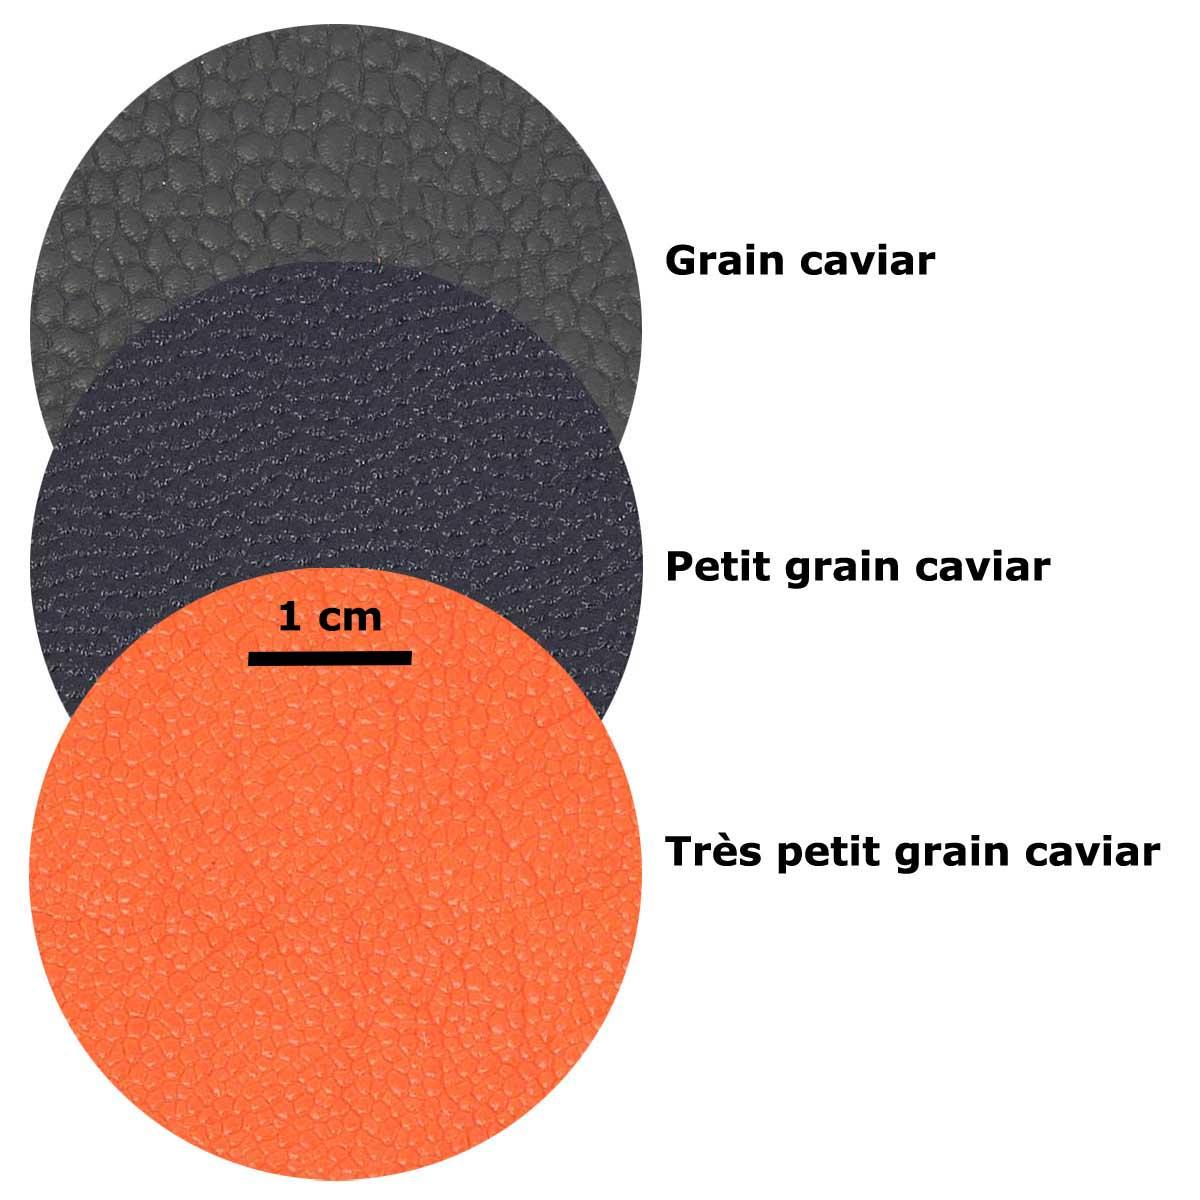 grain caviar